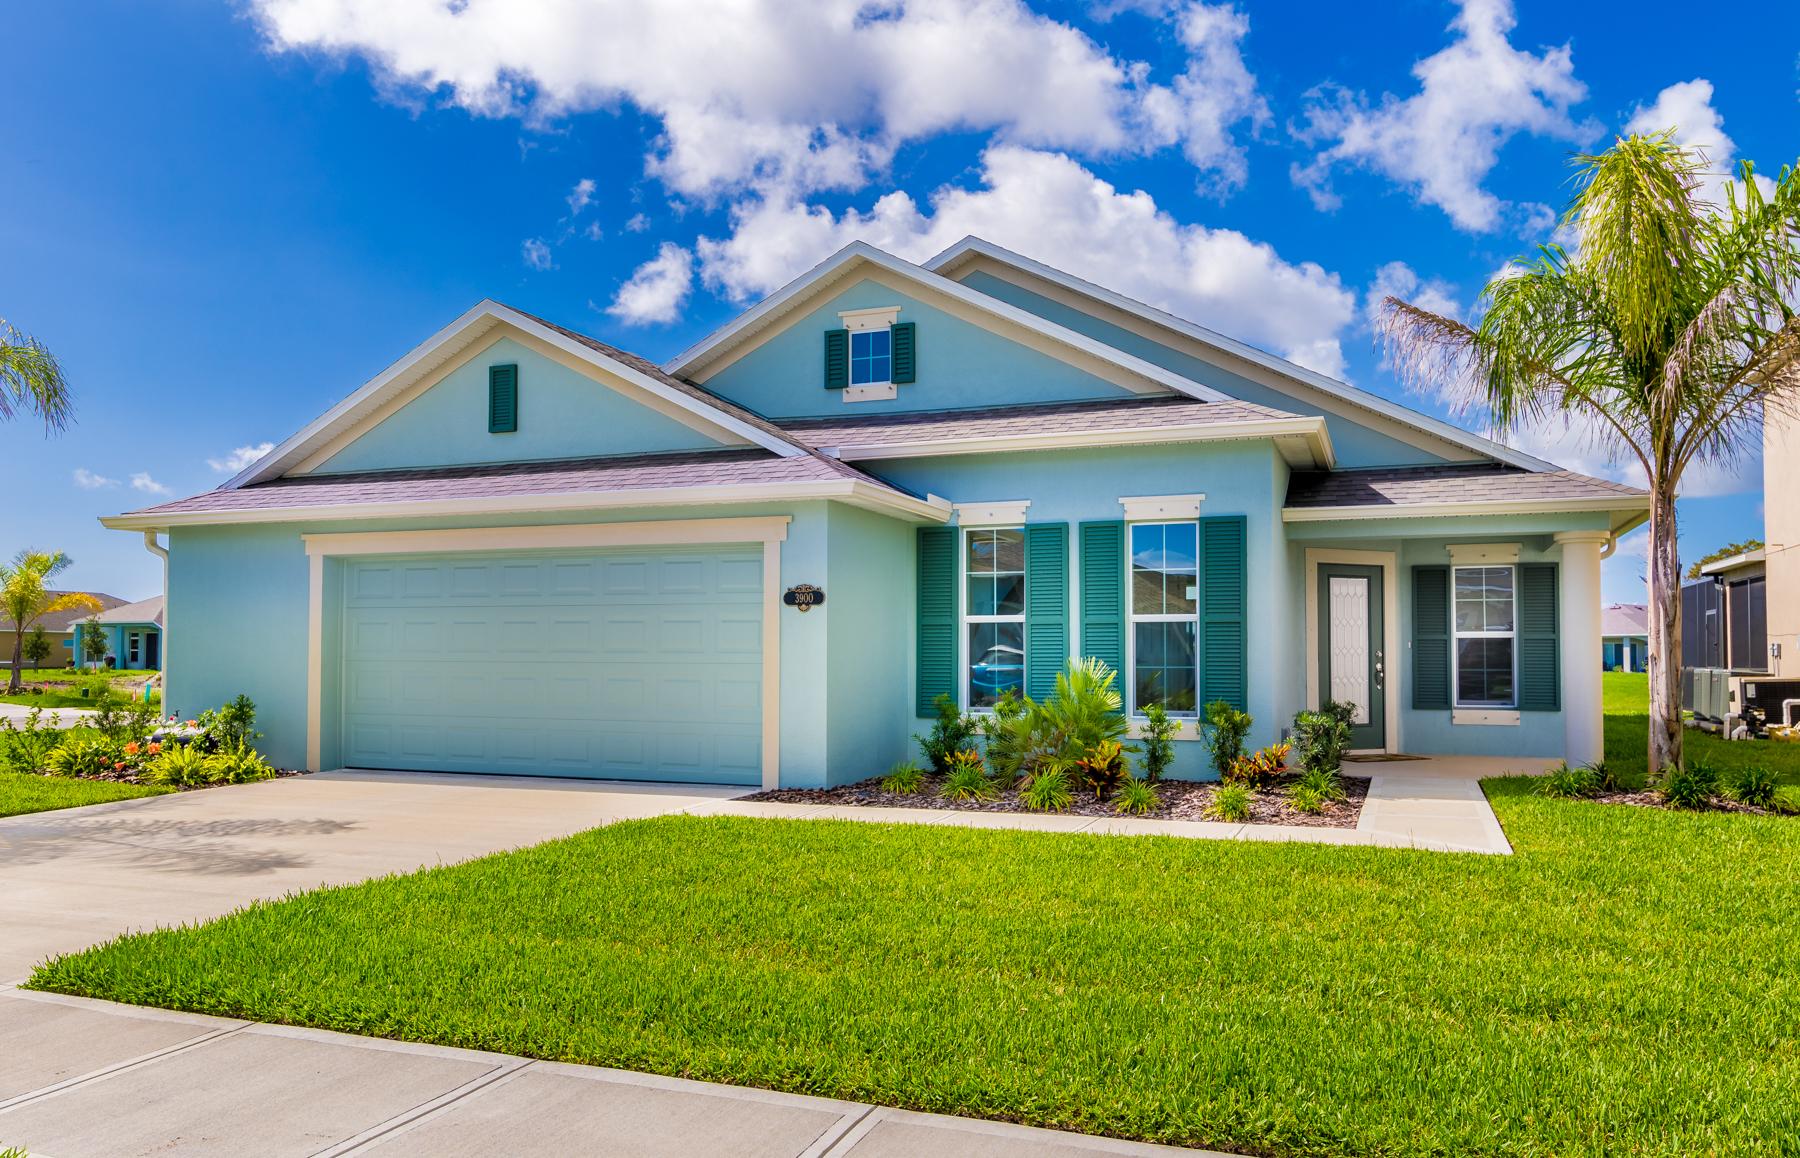 Newly Built Waterfront Home 3900 Sage Brush Circle Melbourne, Florida 32901 Hoa Kỳ